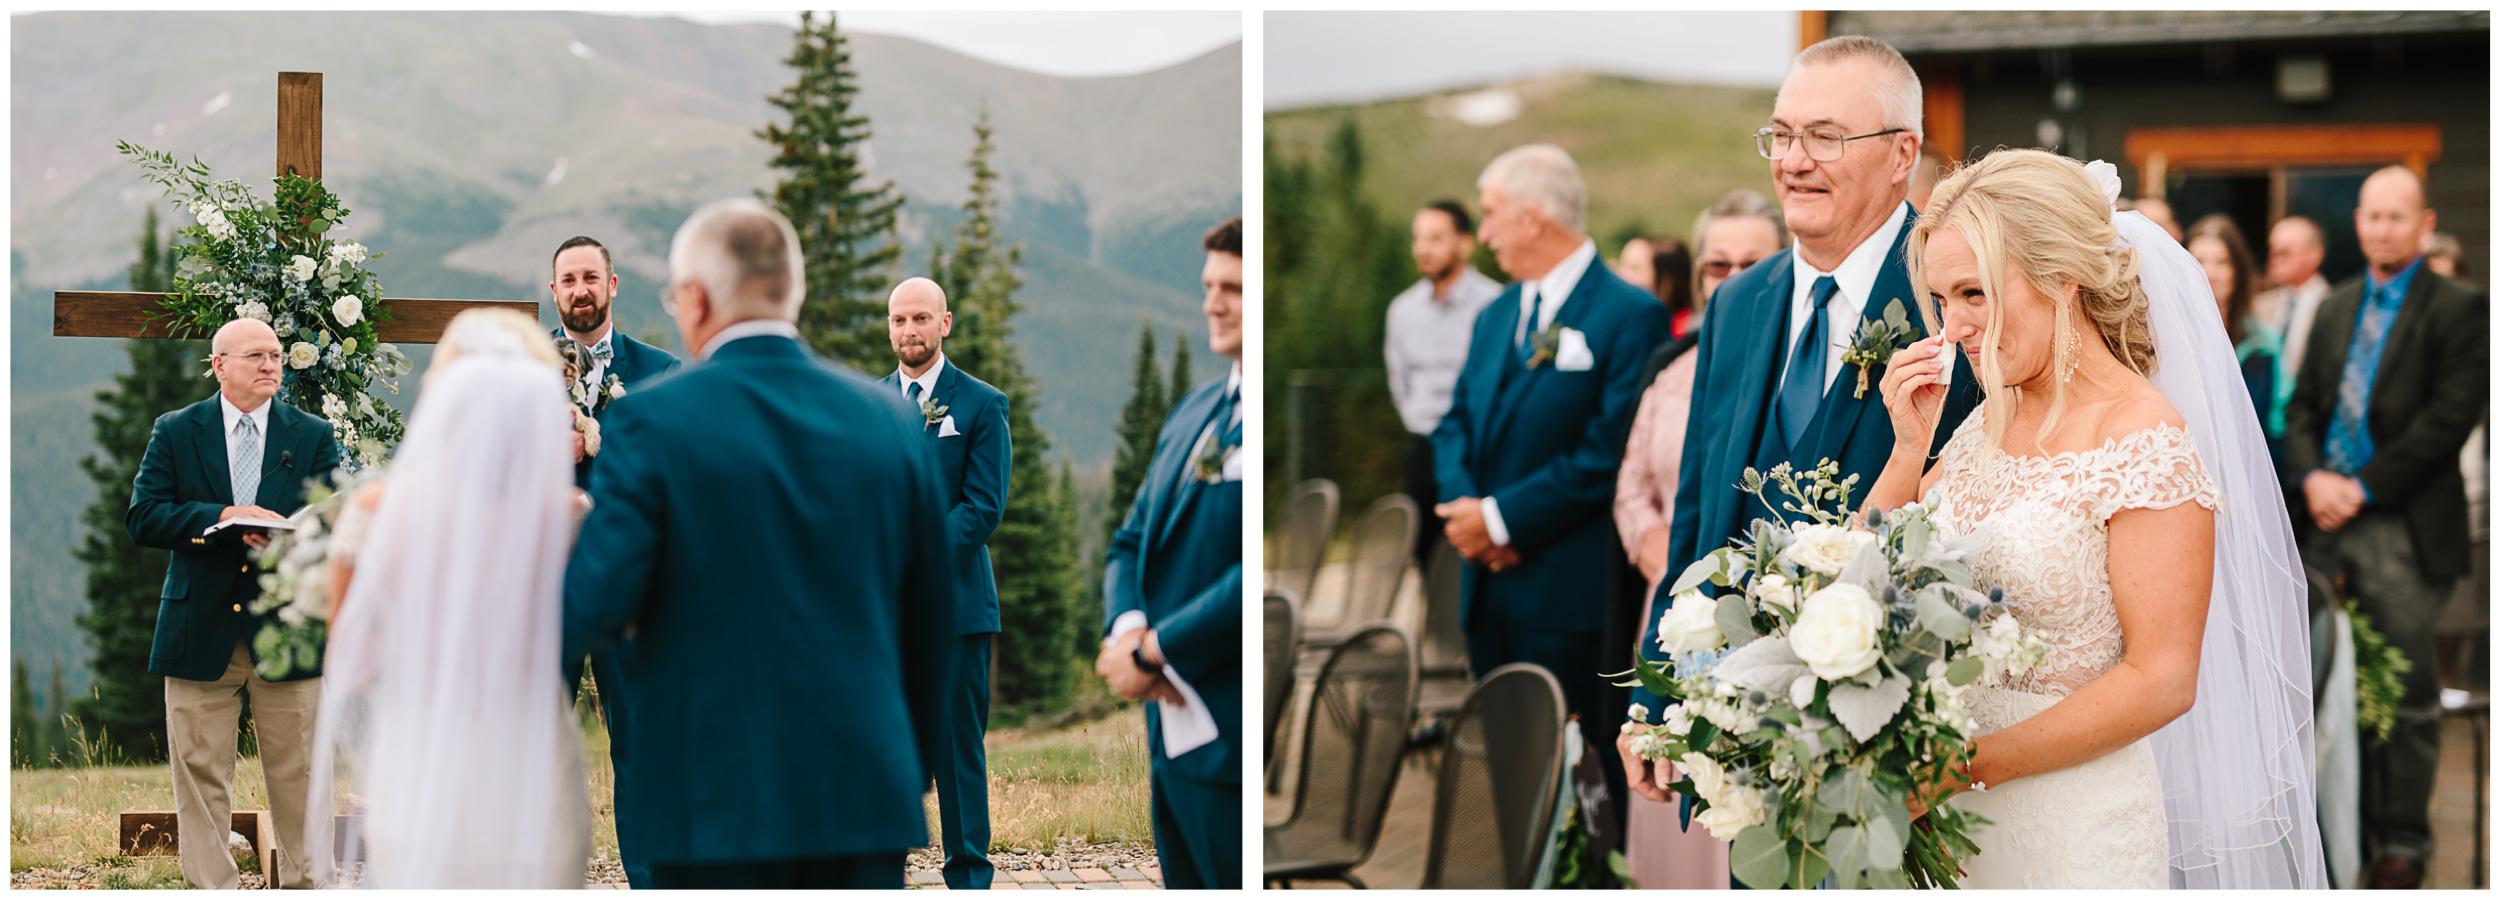 winter_park_wedding_54.jpg